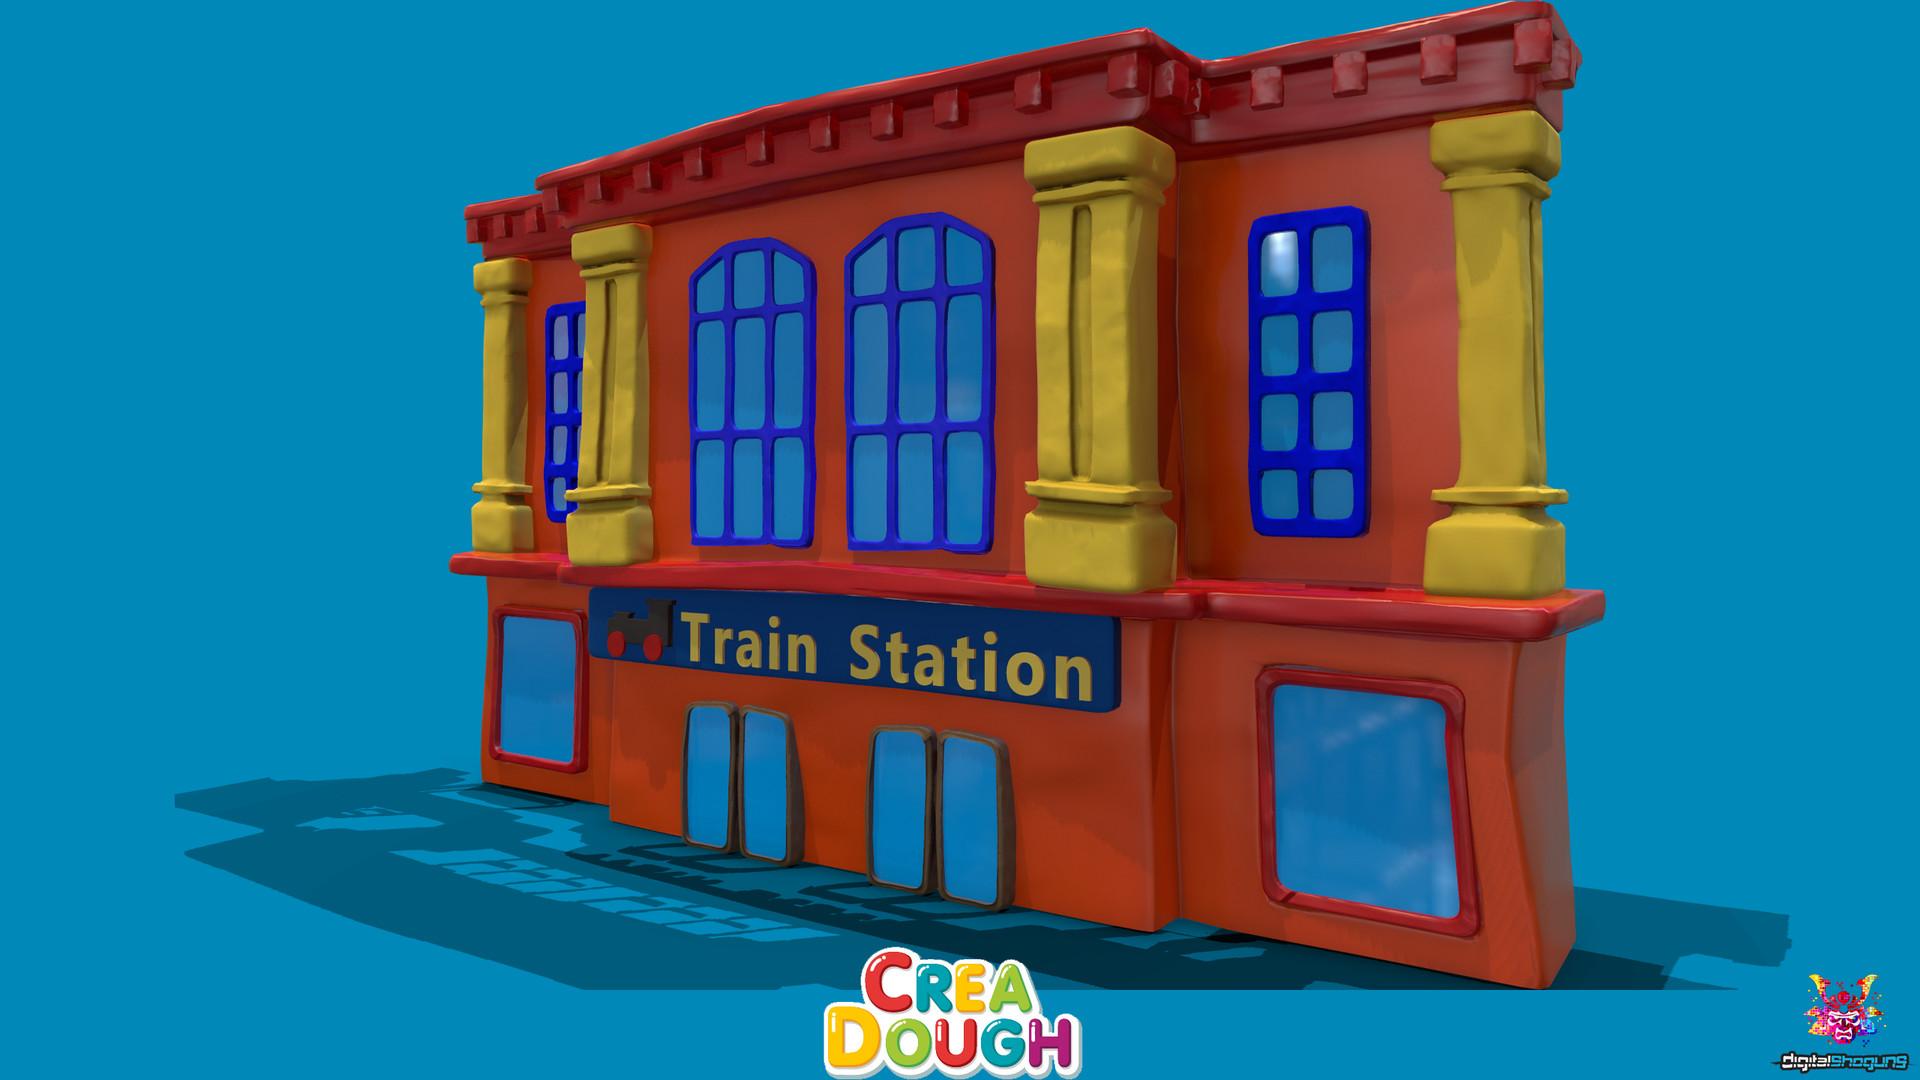 Martin giles train station 002